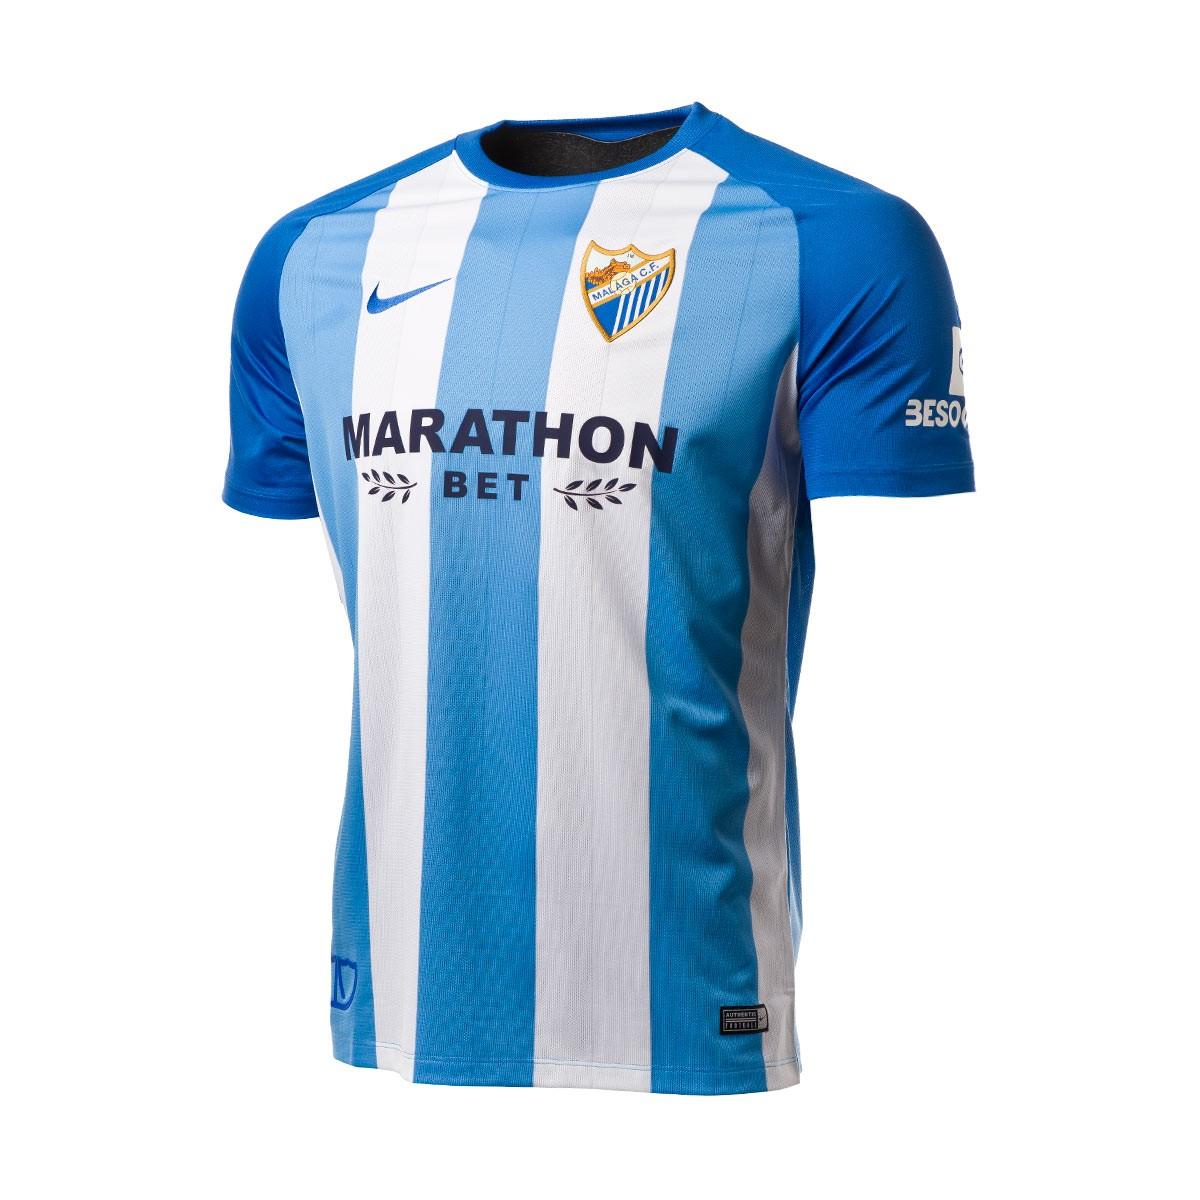 Jersey Nike Málaga CF 1st kit 2017-2018 White-Blue - Football store ... 41d9c97aa